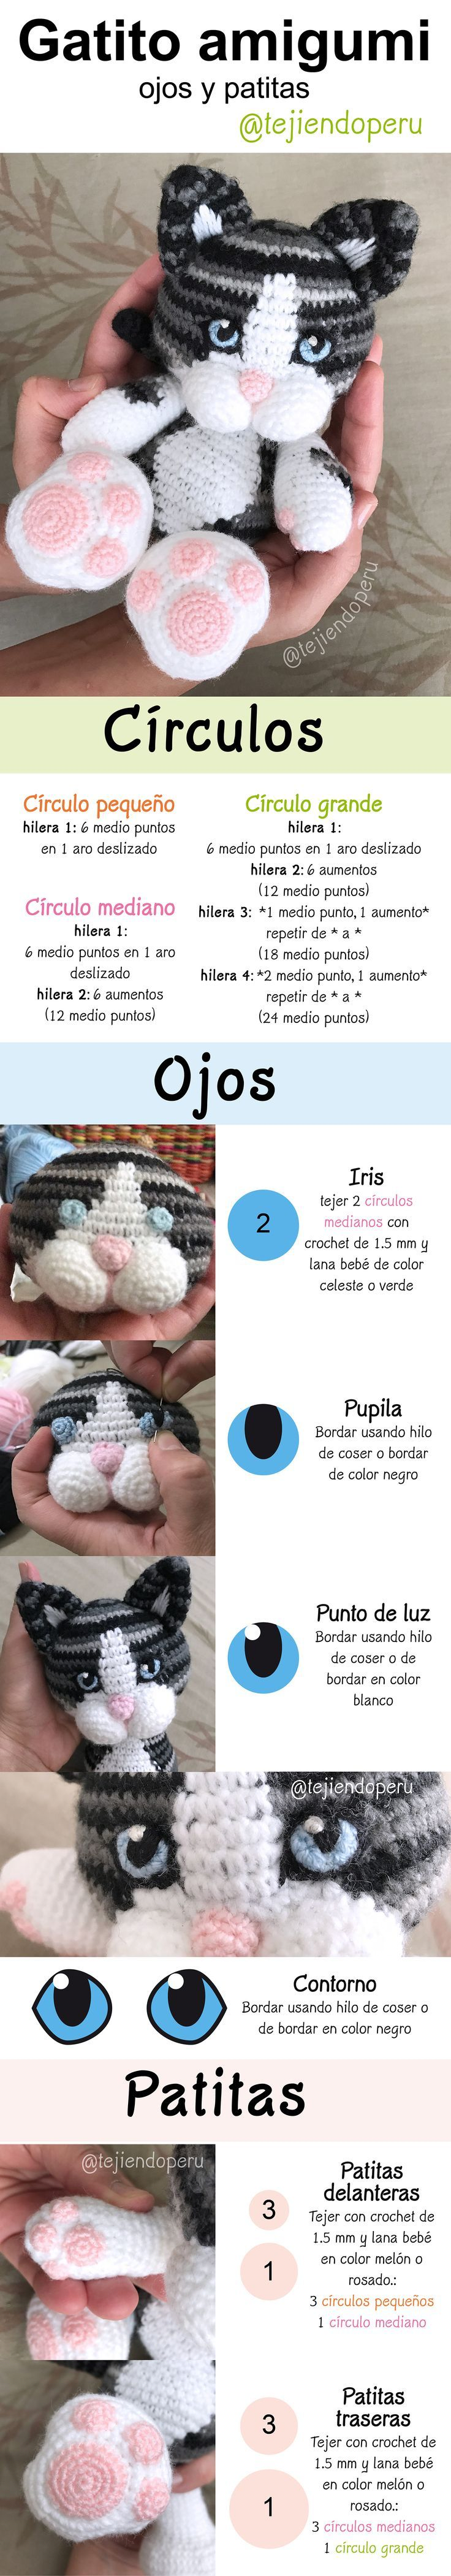 65 best amigurumi images on Pinterest | Crochet patterns, Crochet ...